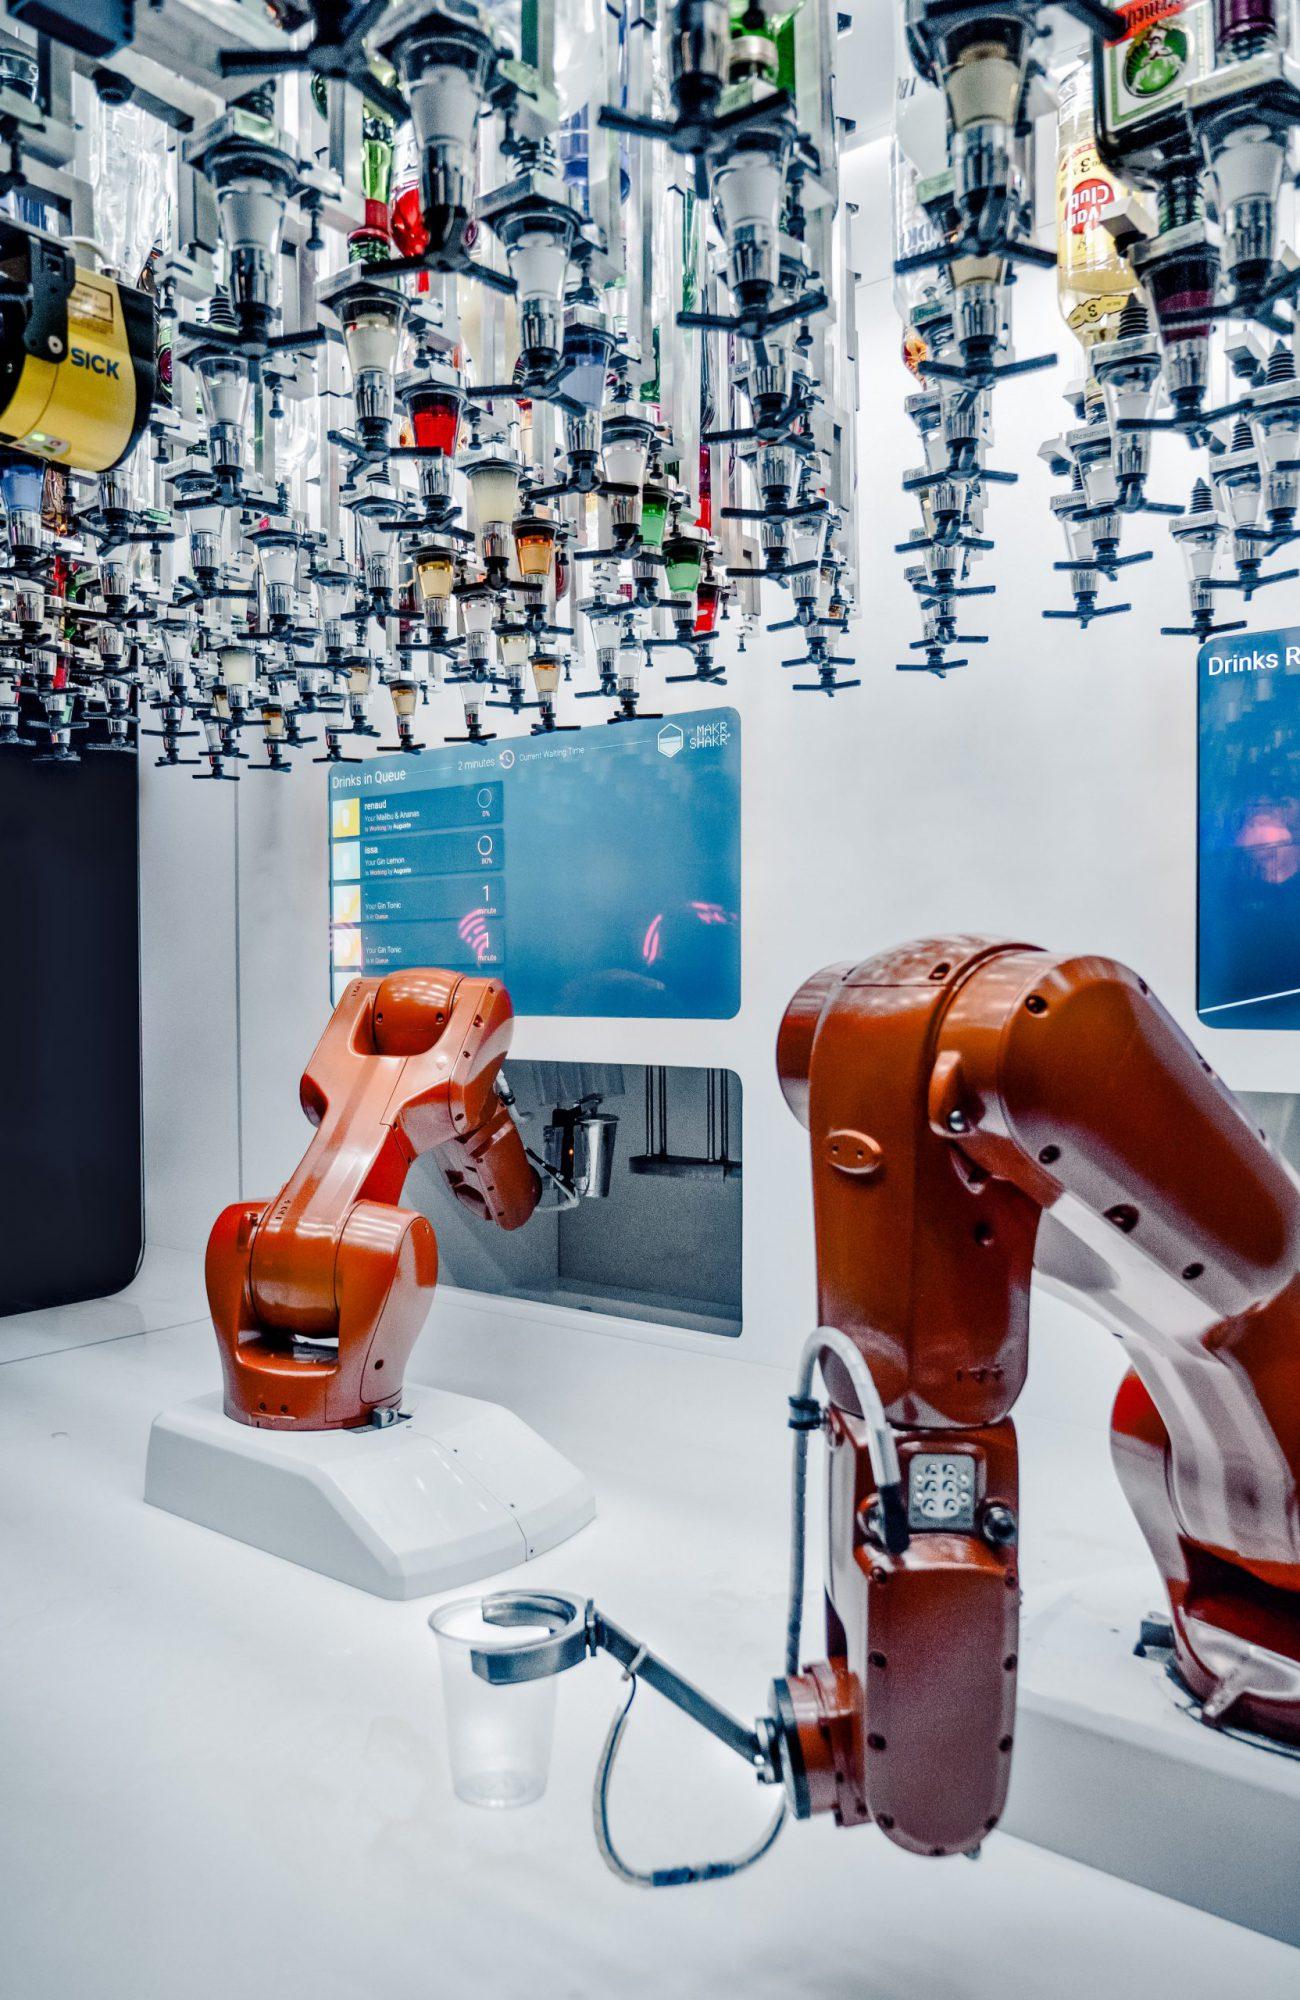 rote roboterarme in weißem raum